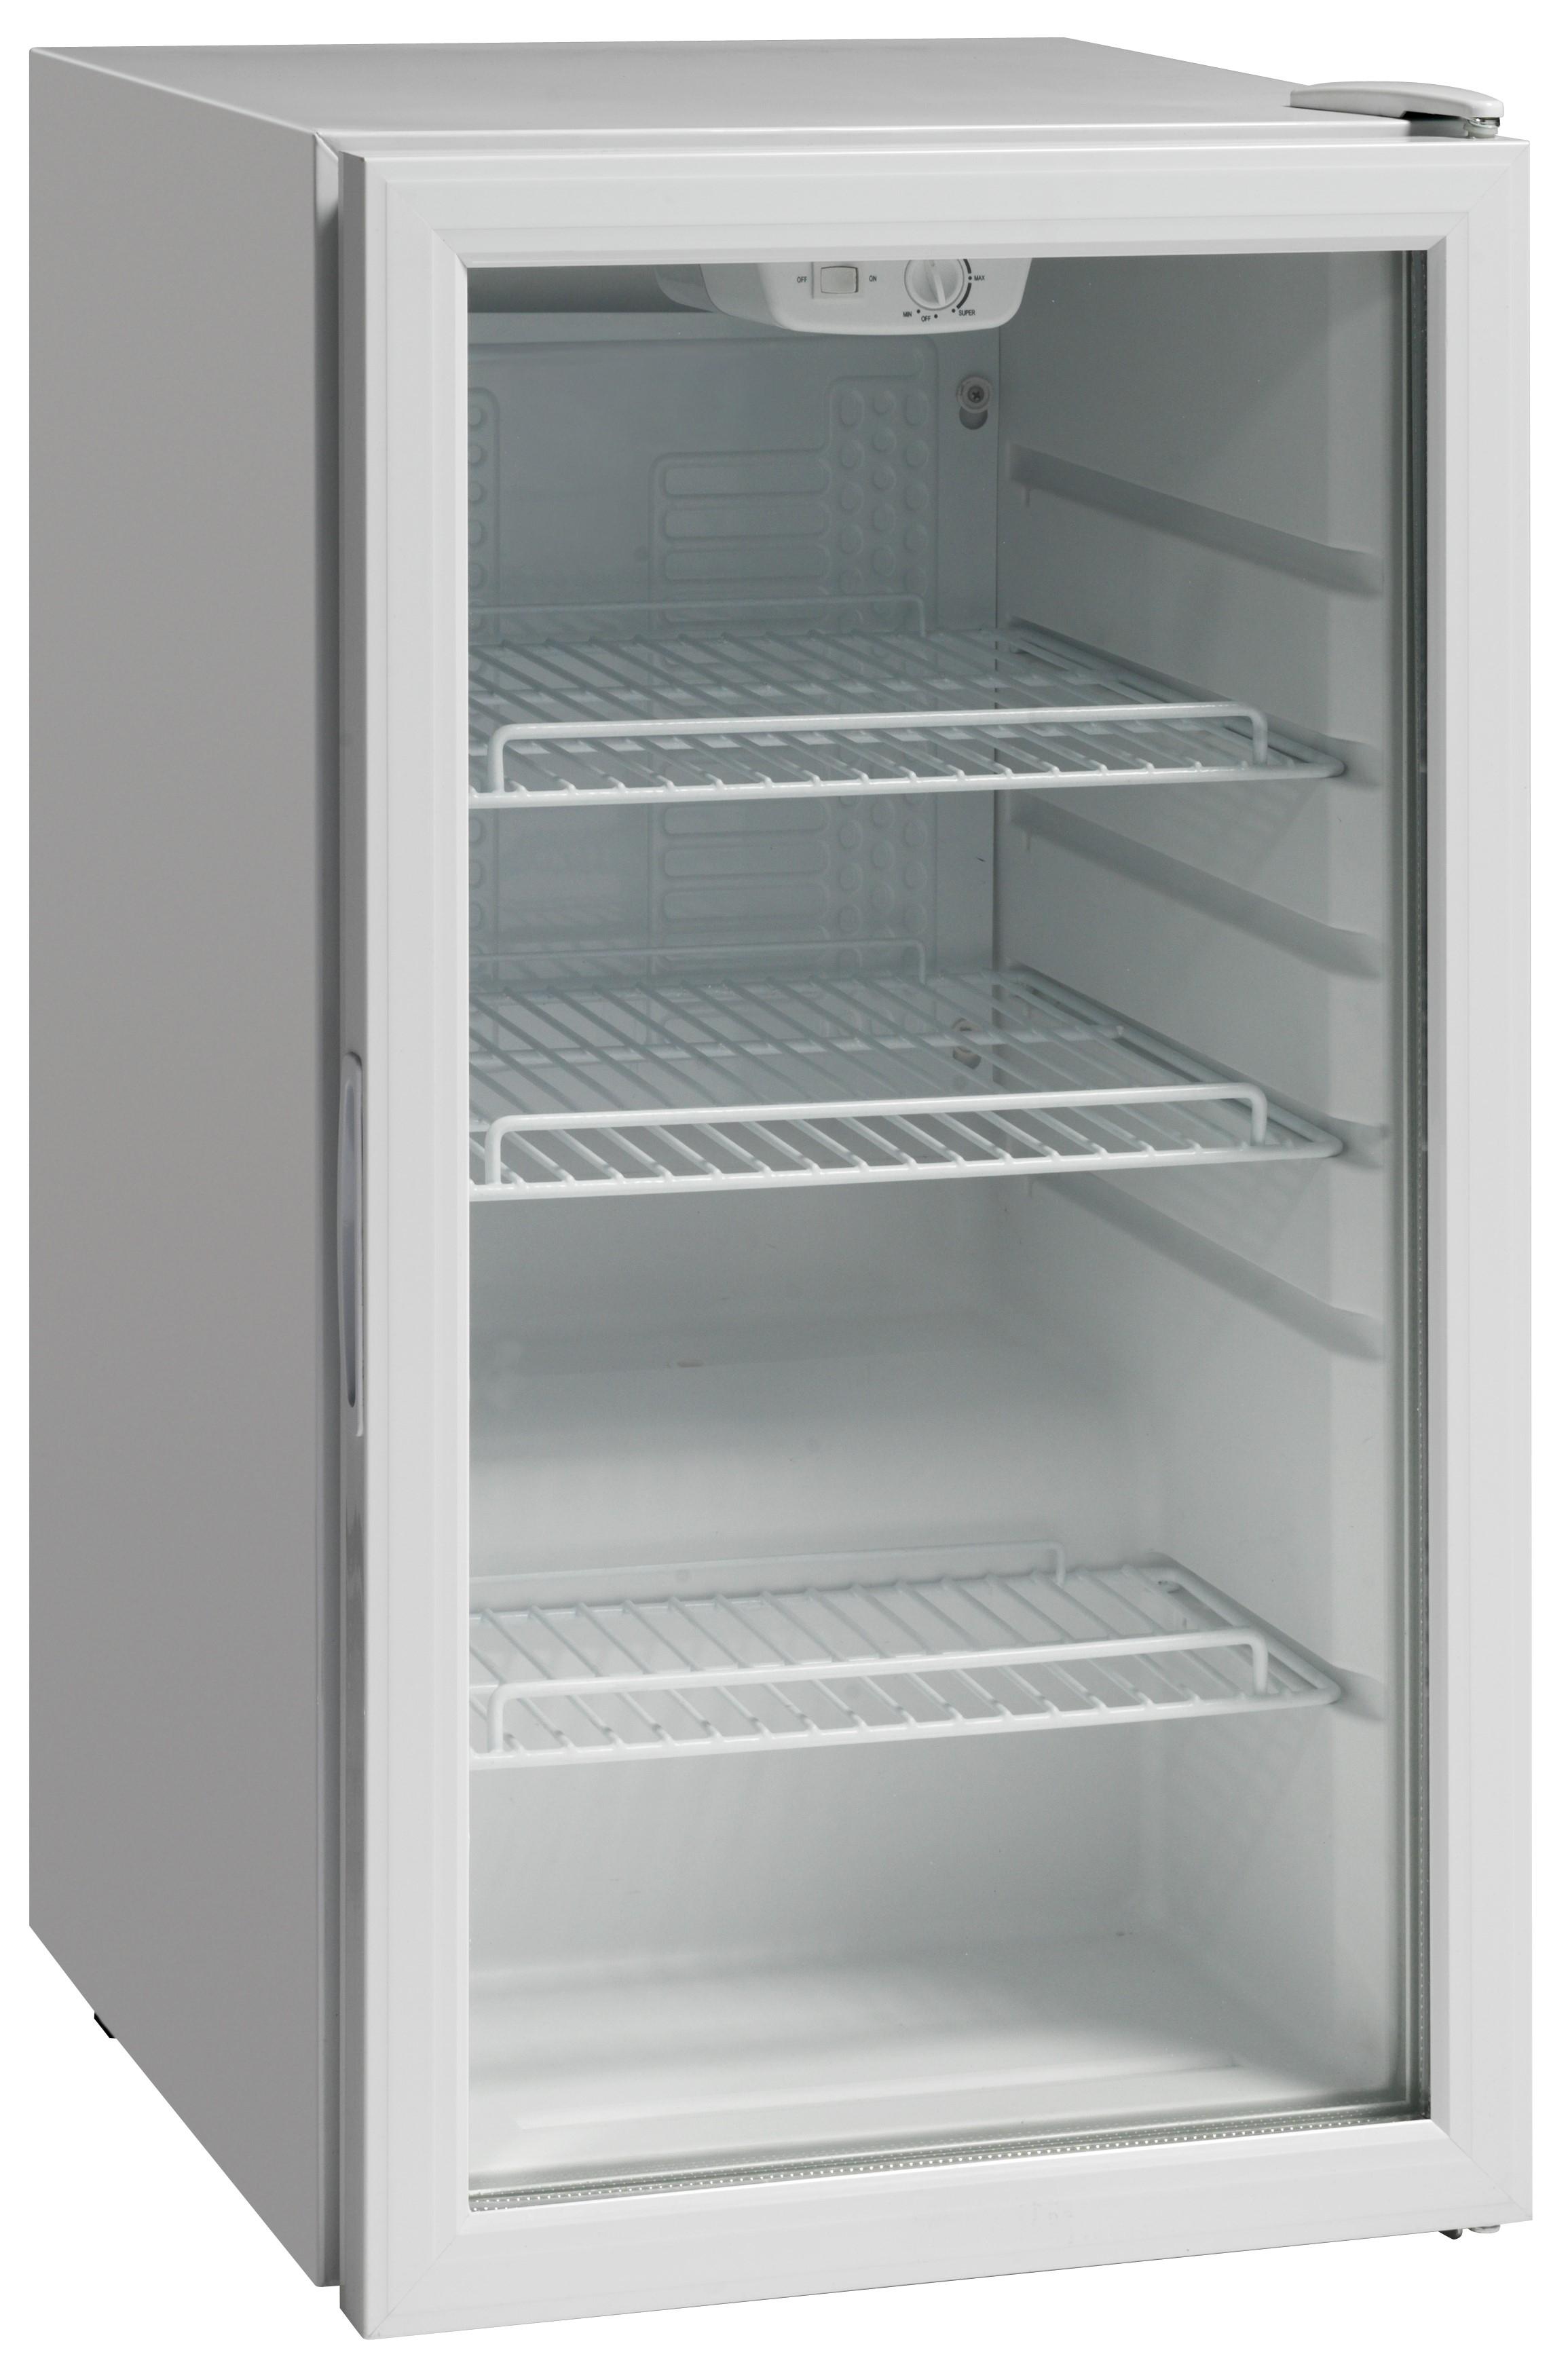 Getränkekühlschrank ECO 105 Online-Shop GASTRO-HELD Austria